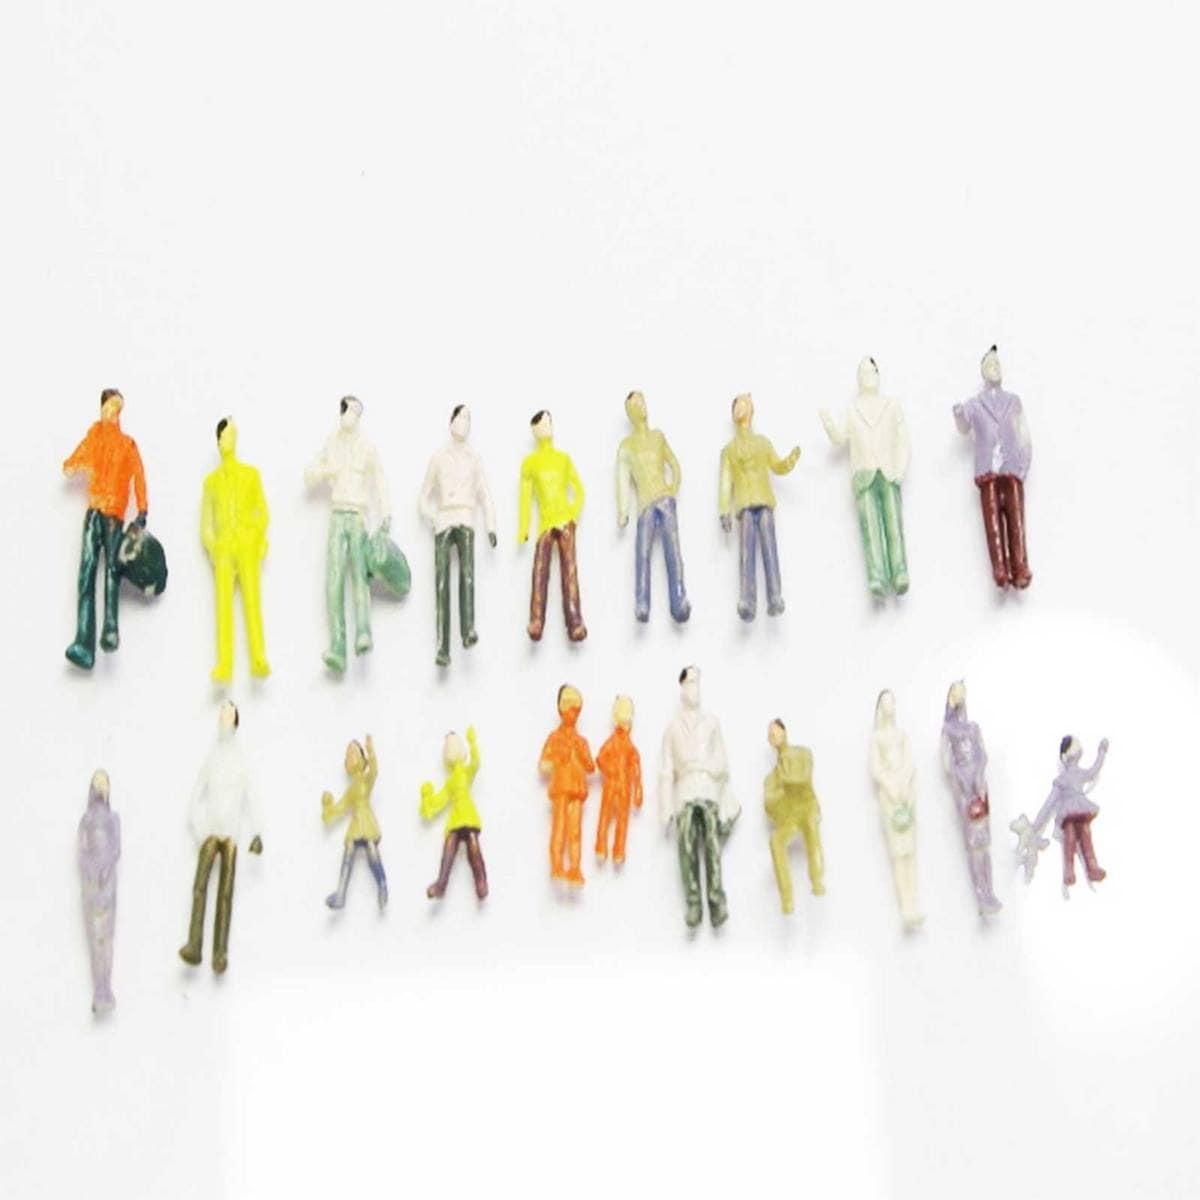 Architectural Miniature Figure Model